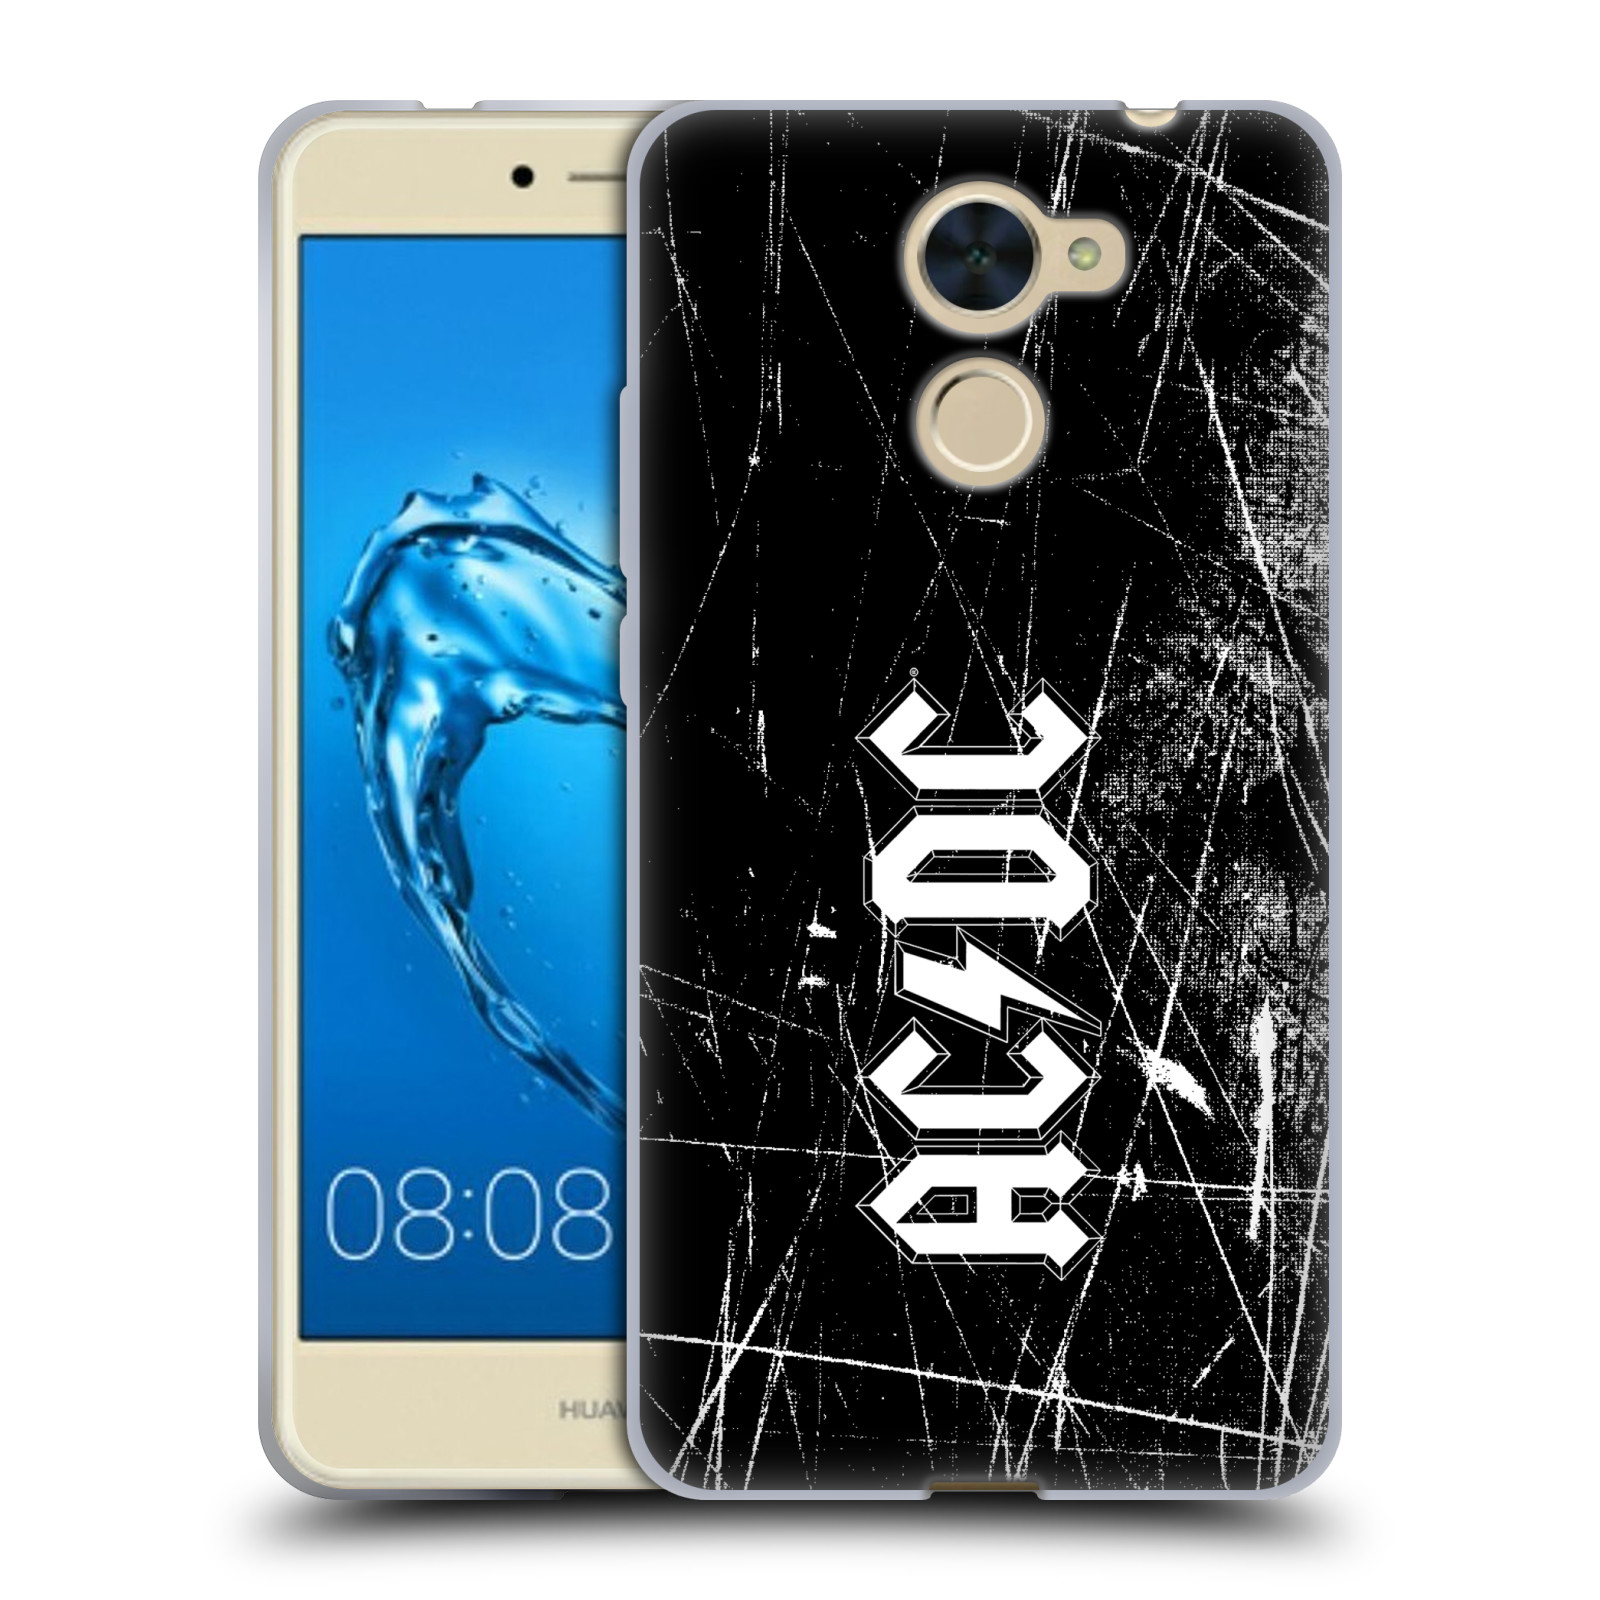 Silikonové pouzdro na mobil Huawei Y7 - Head Case - AC/DC Černobílé logo